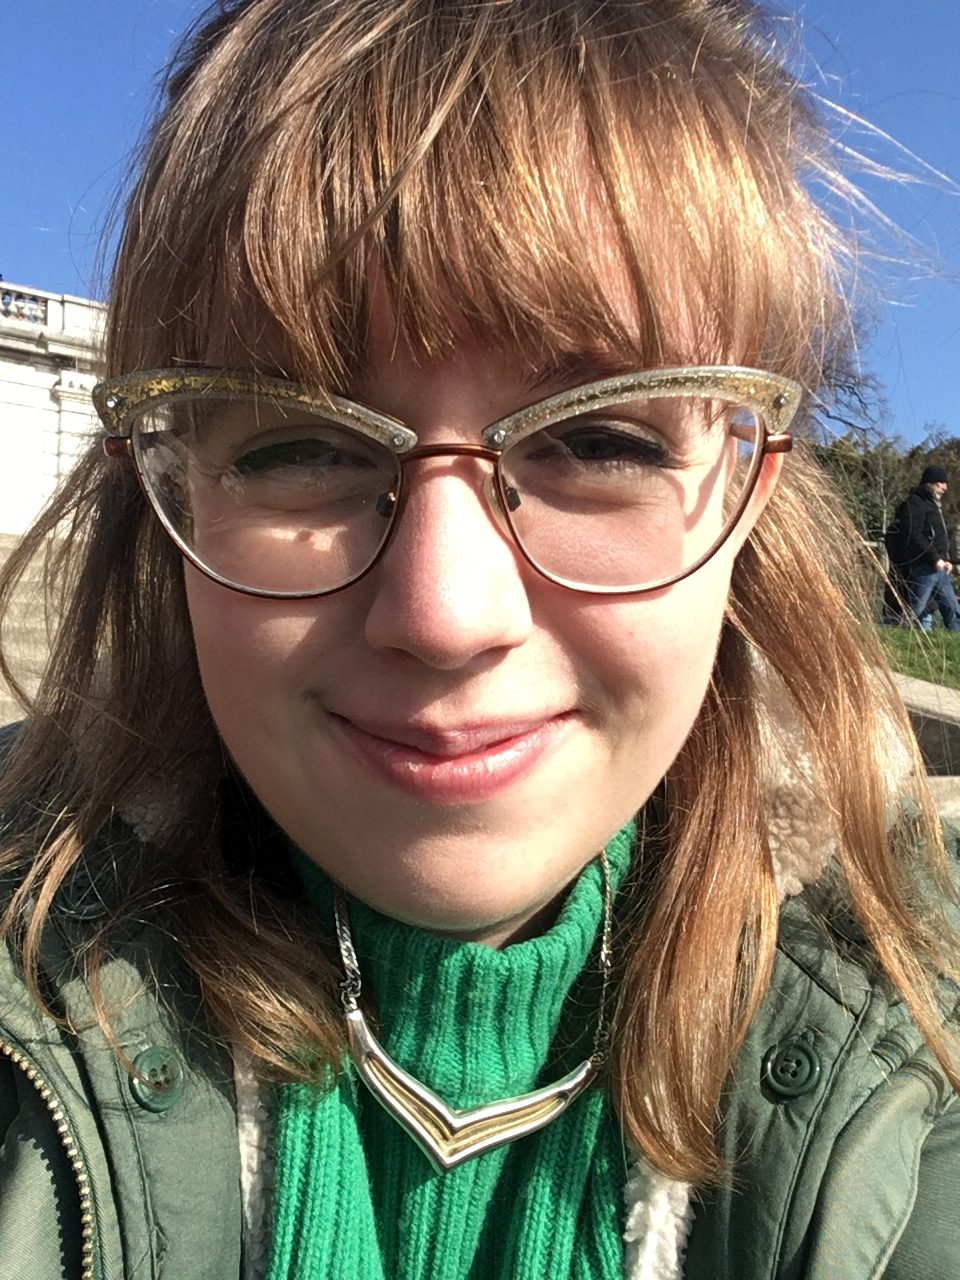 A close-up selfie of Hattie Callery